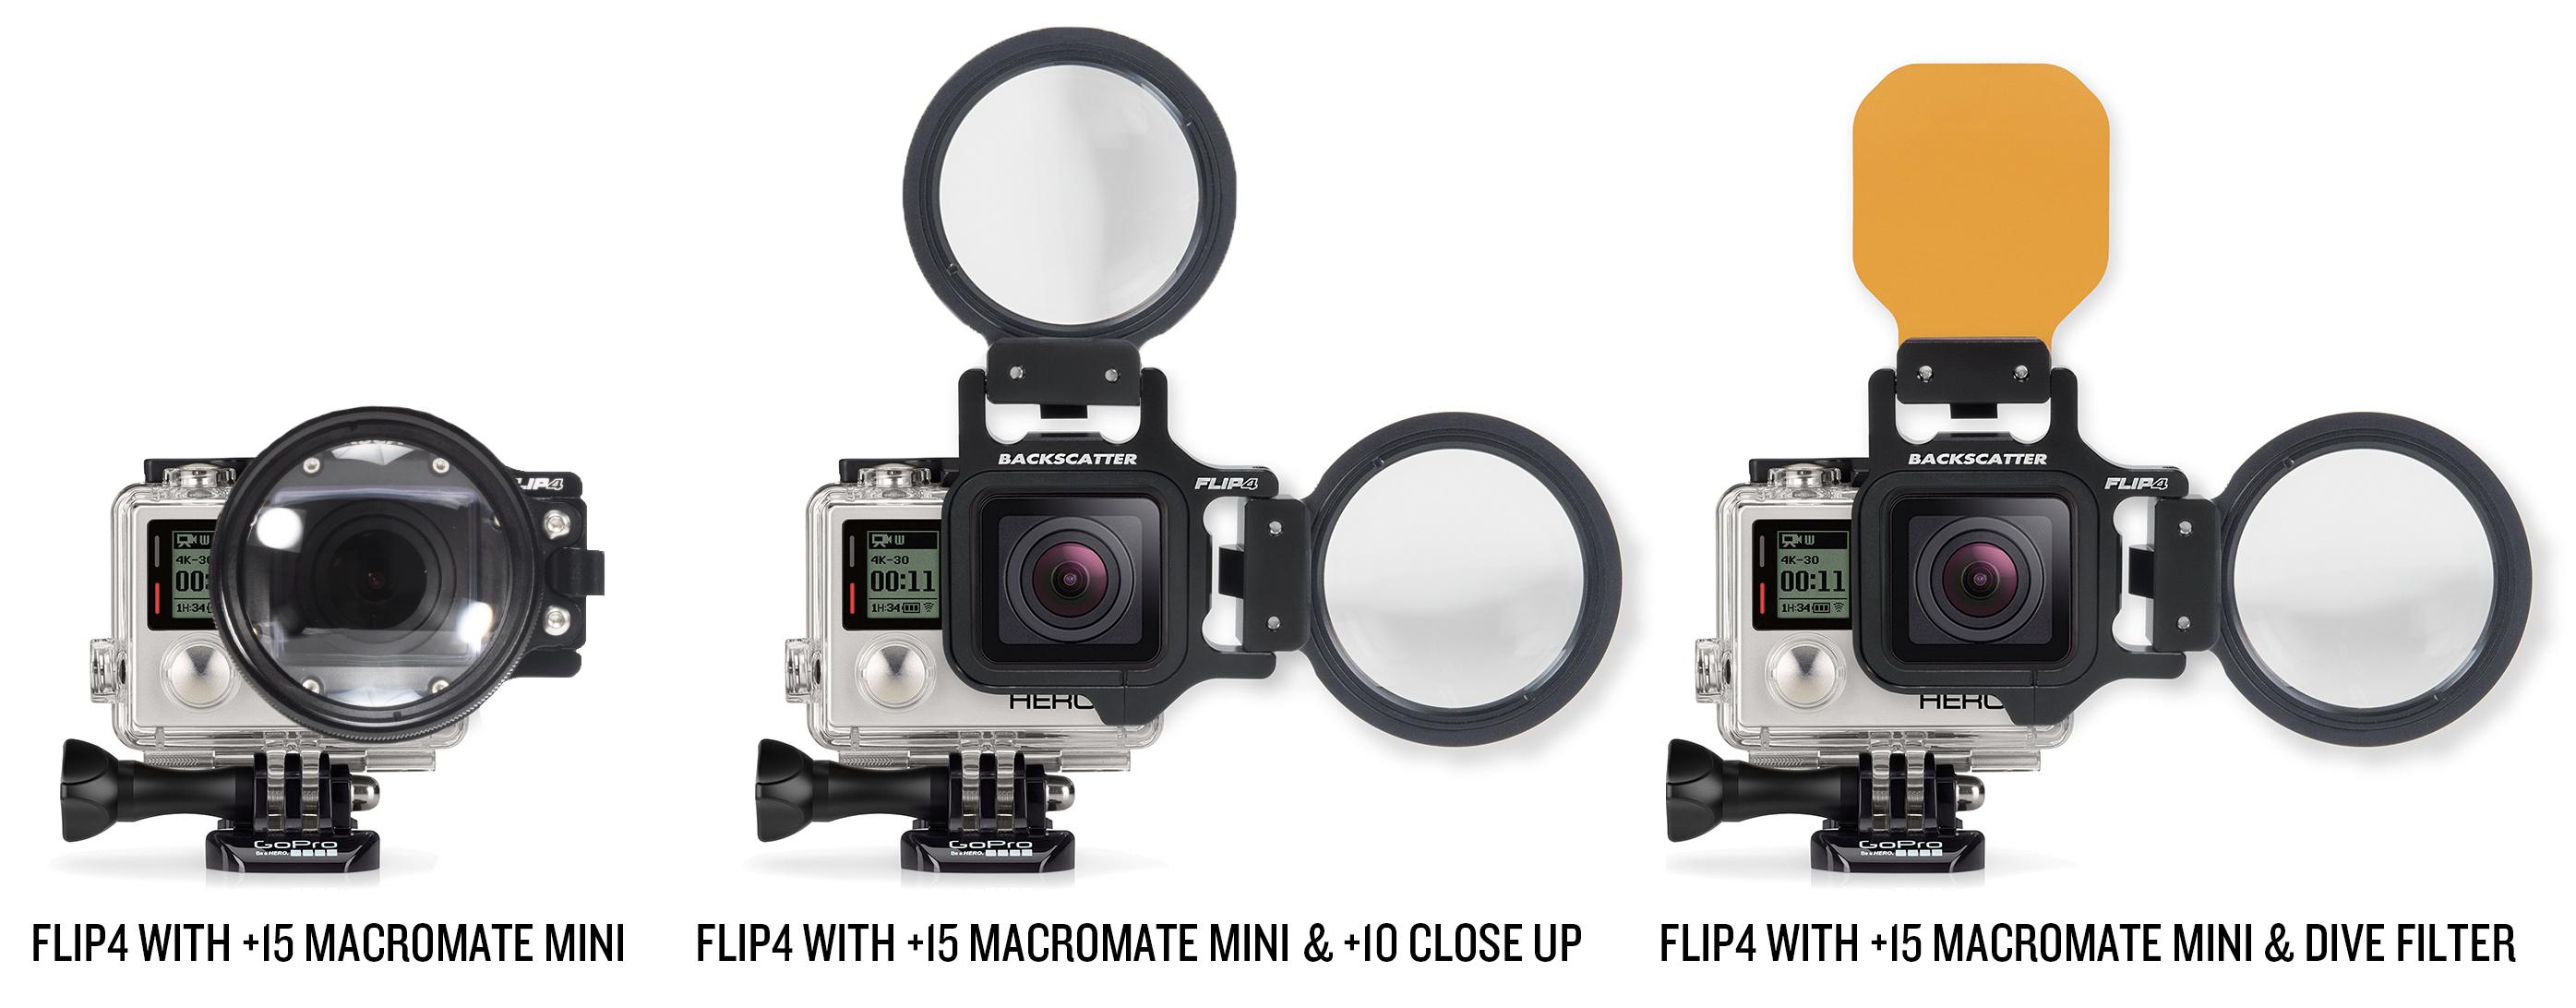 GoPro Underwater Macro Lens - Macro mate Mini - FLIP Configurations